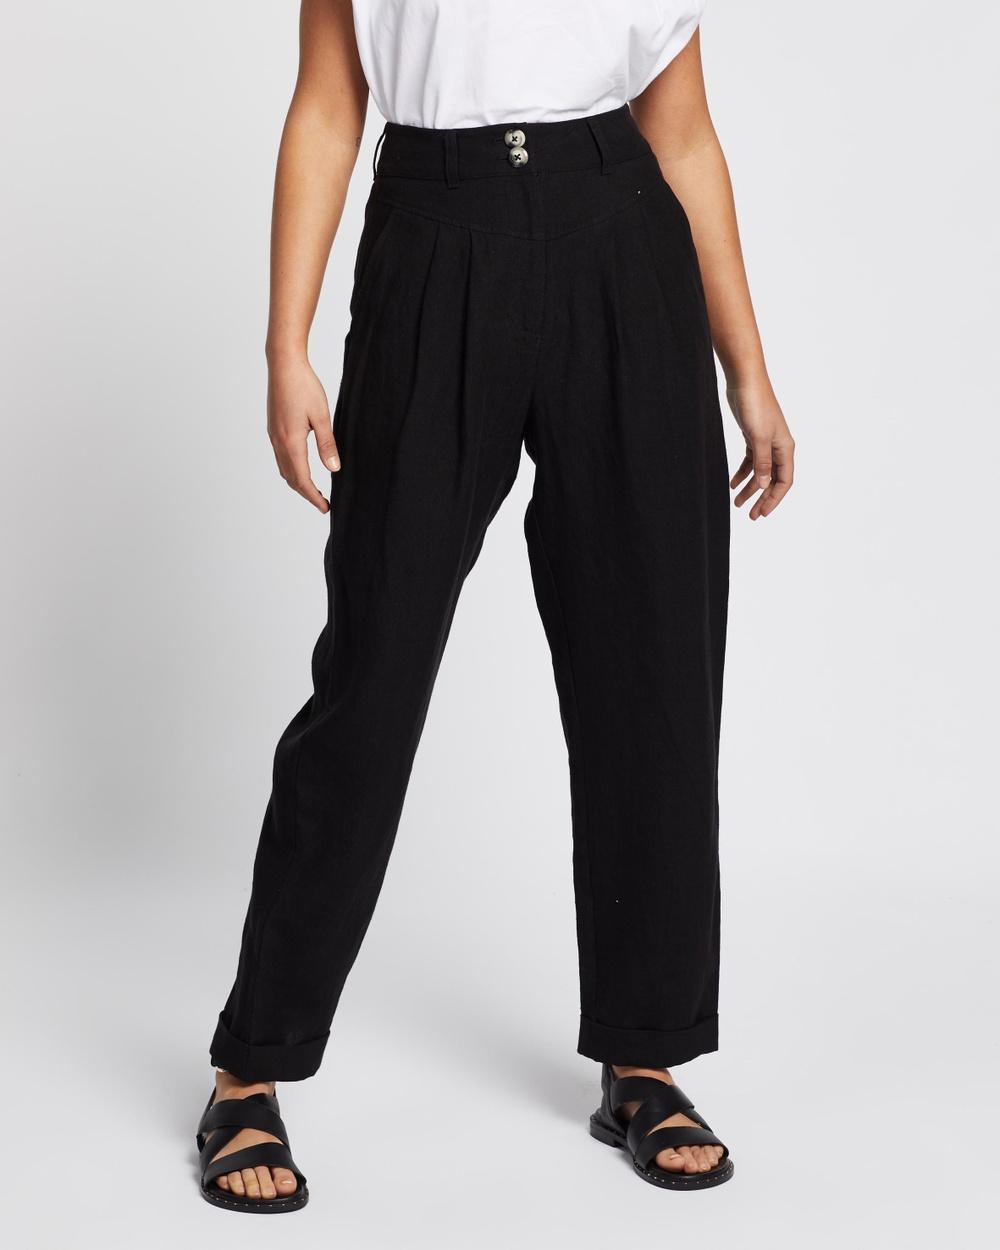 AERE Linen Tapered Pants Black